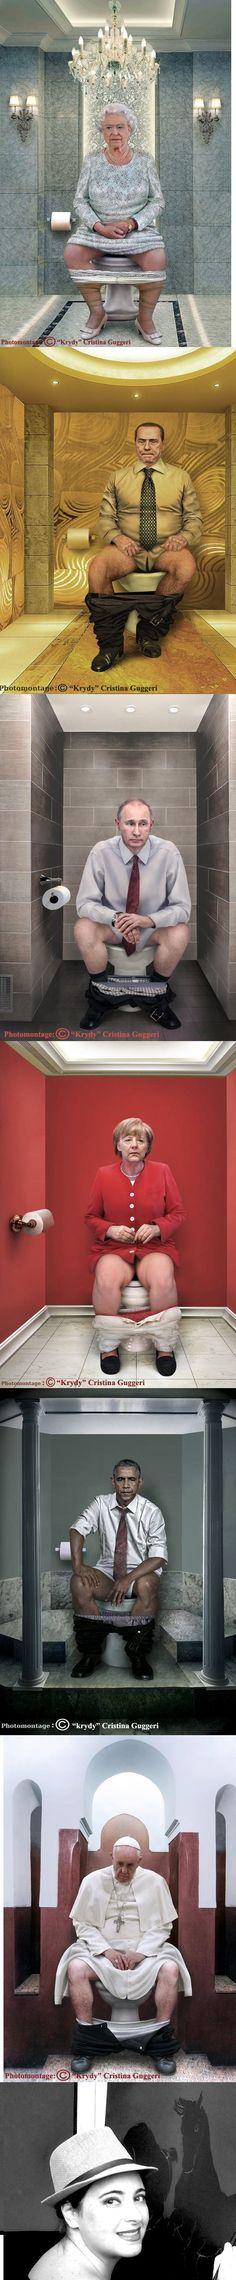 World Leaders taking a dumb......